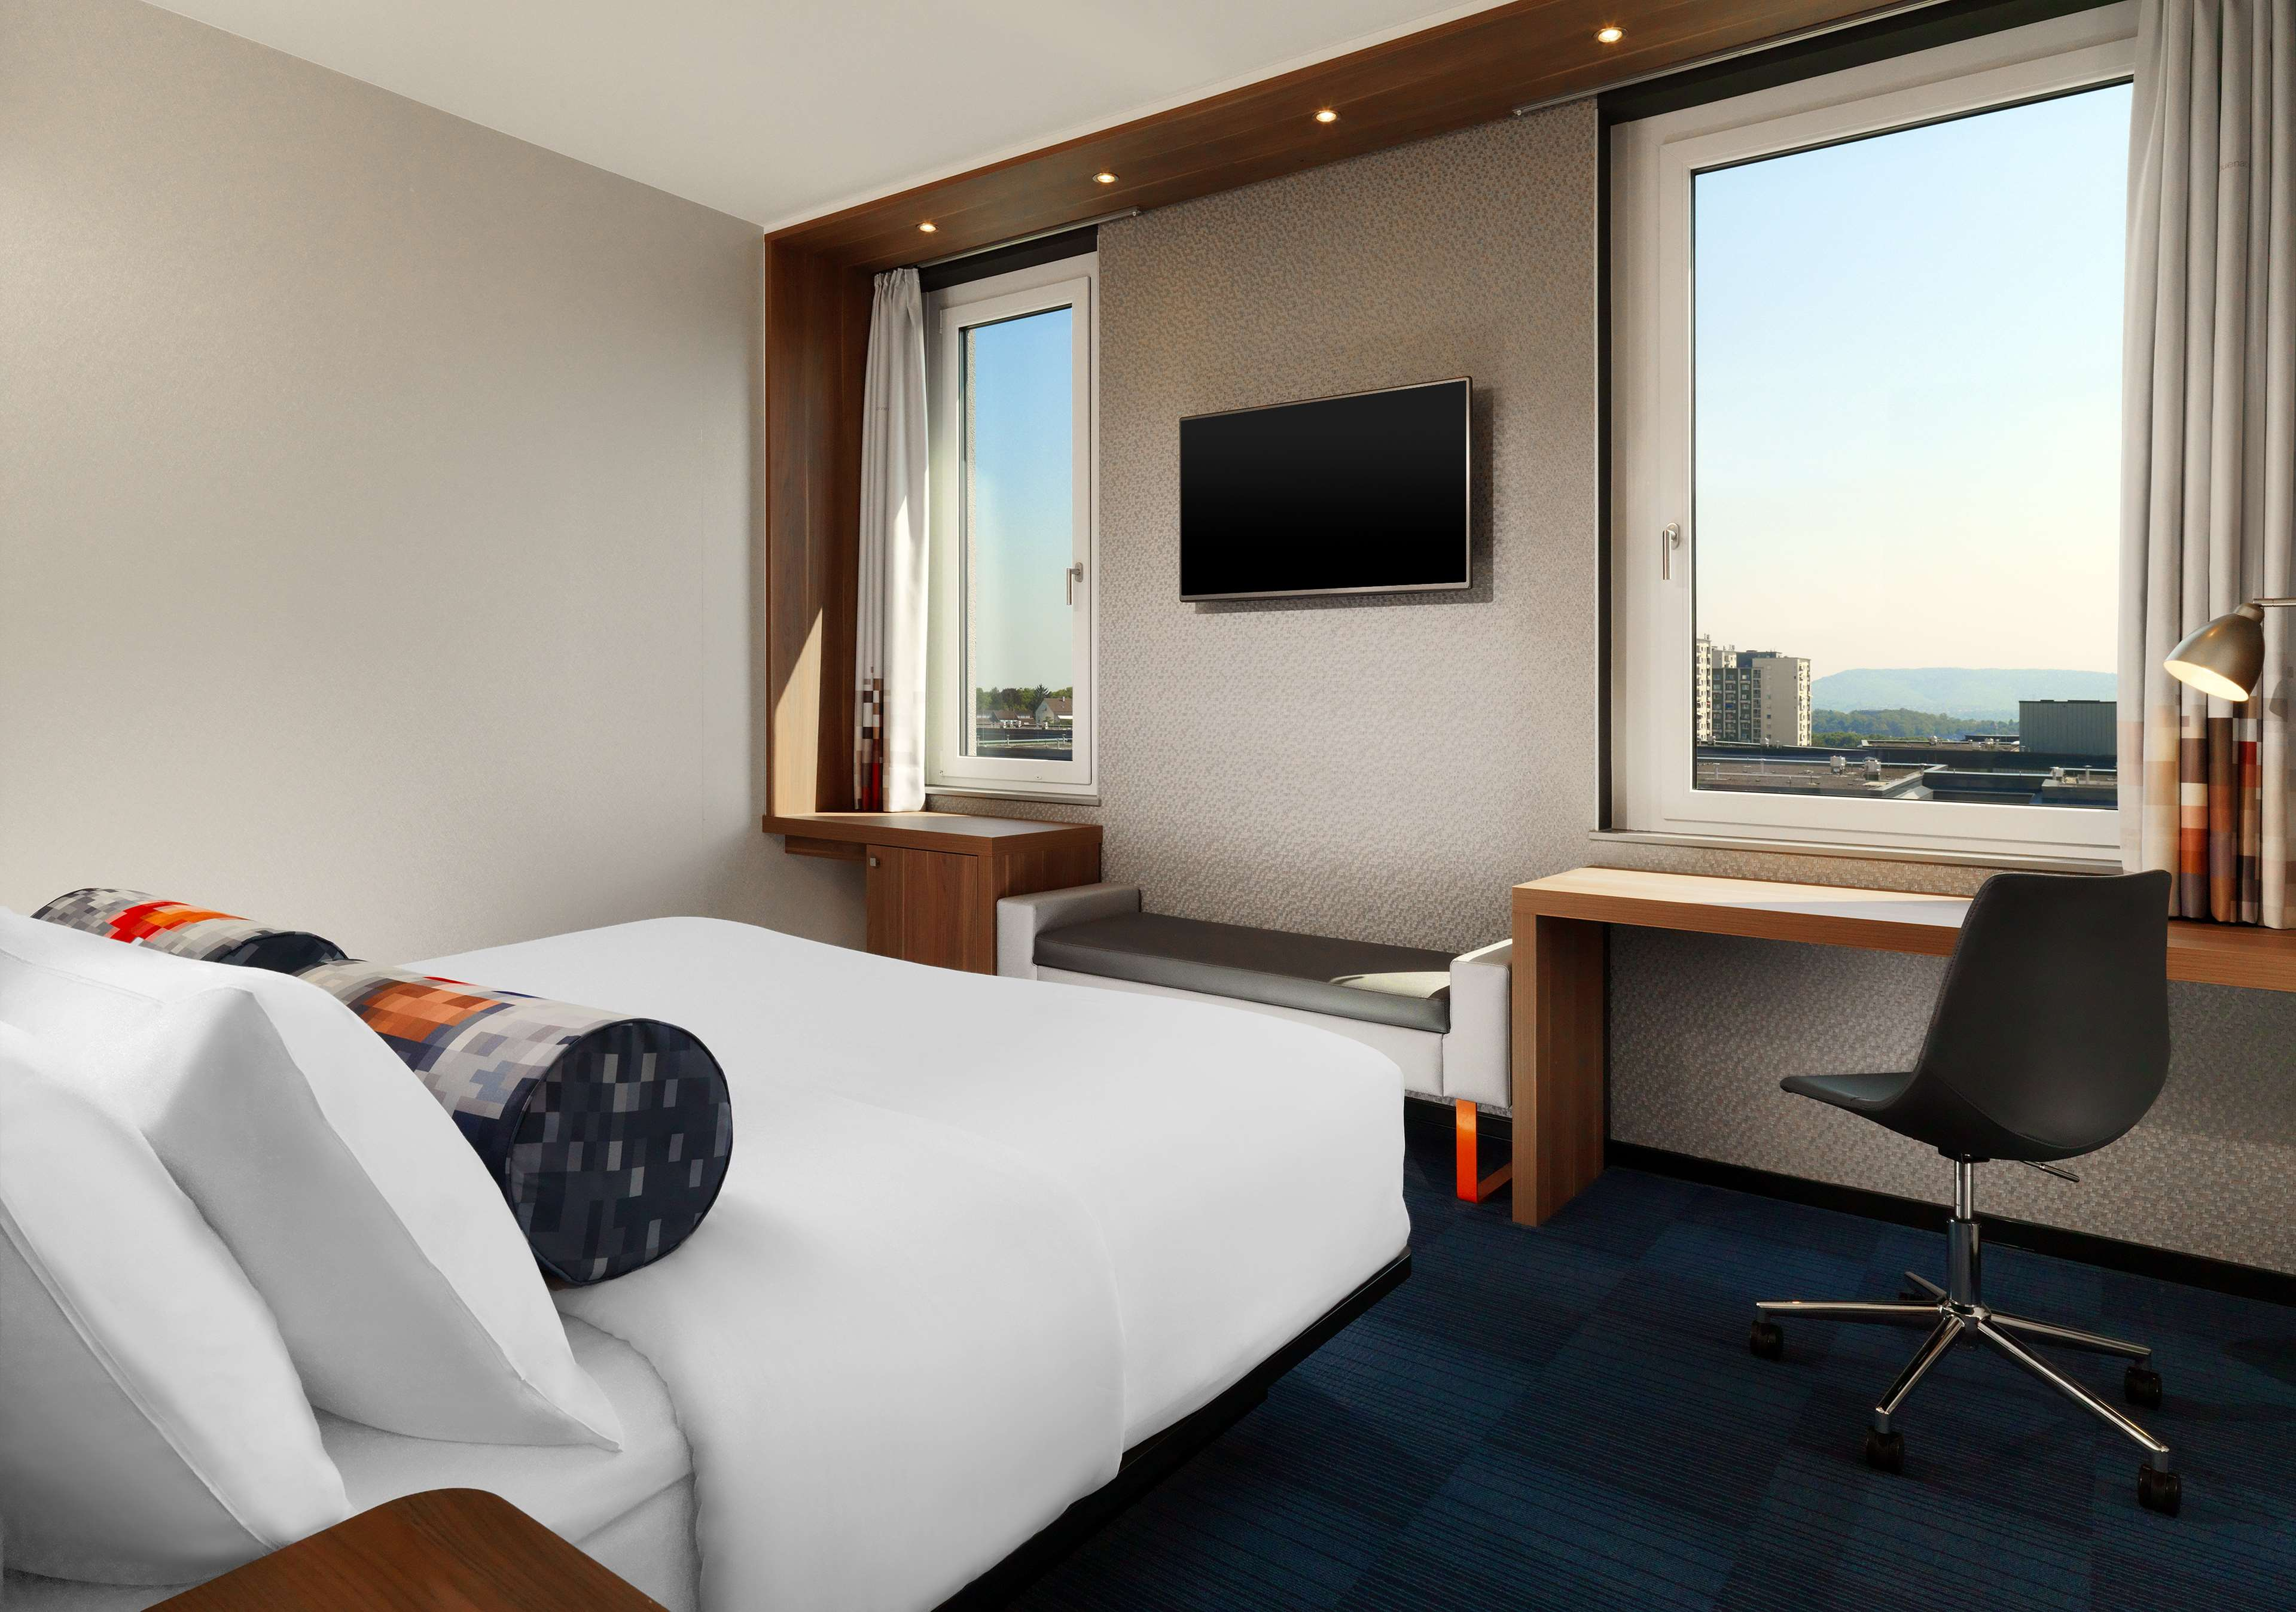 aloft stuttgart hotels hotels restaurants stuttgart deutschland tel 071187875. Black Bedroom Furniture Sets. Home Design Ideas